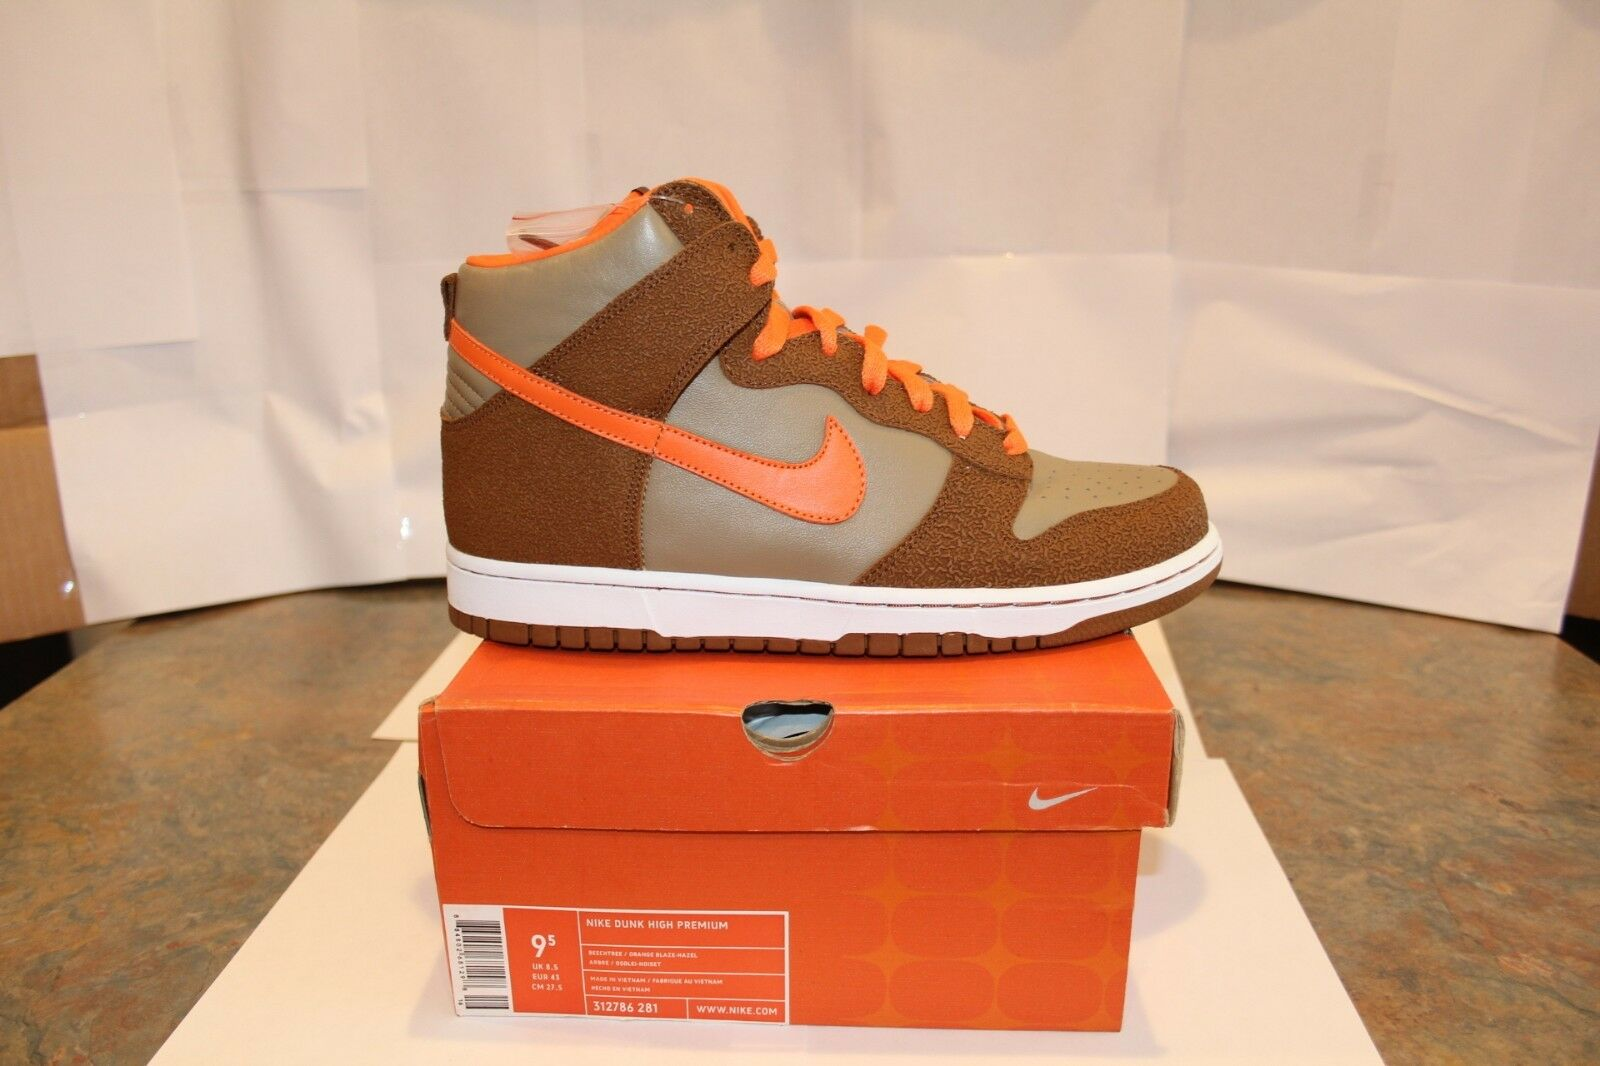 Nike dunk hohen premium - - beechtree 9,5 - - kasten!!!!!!!! e99483